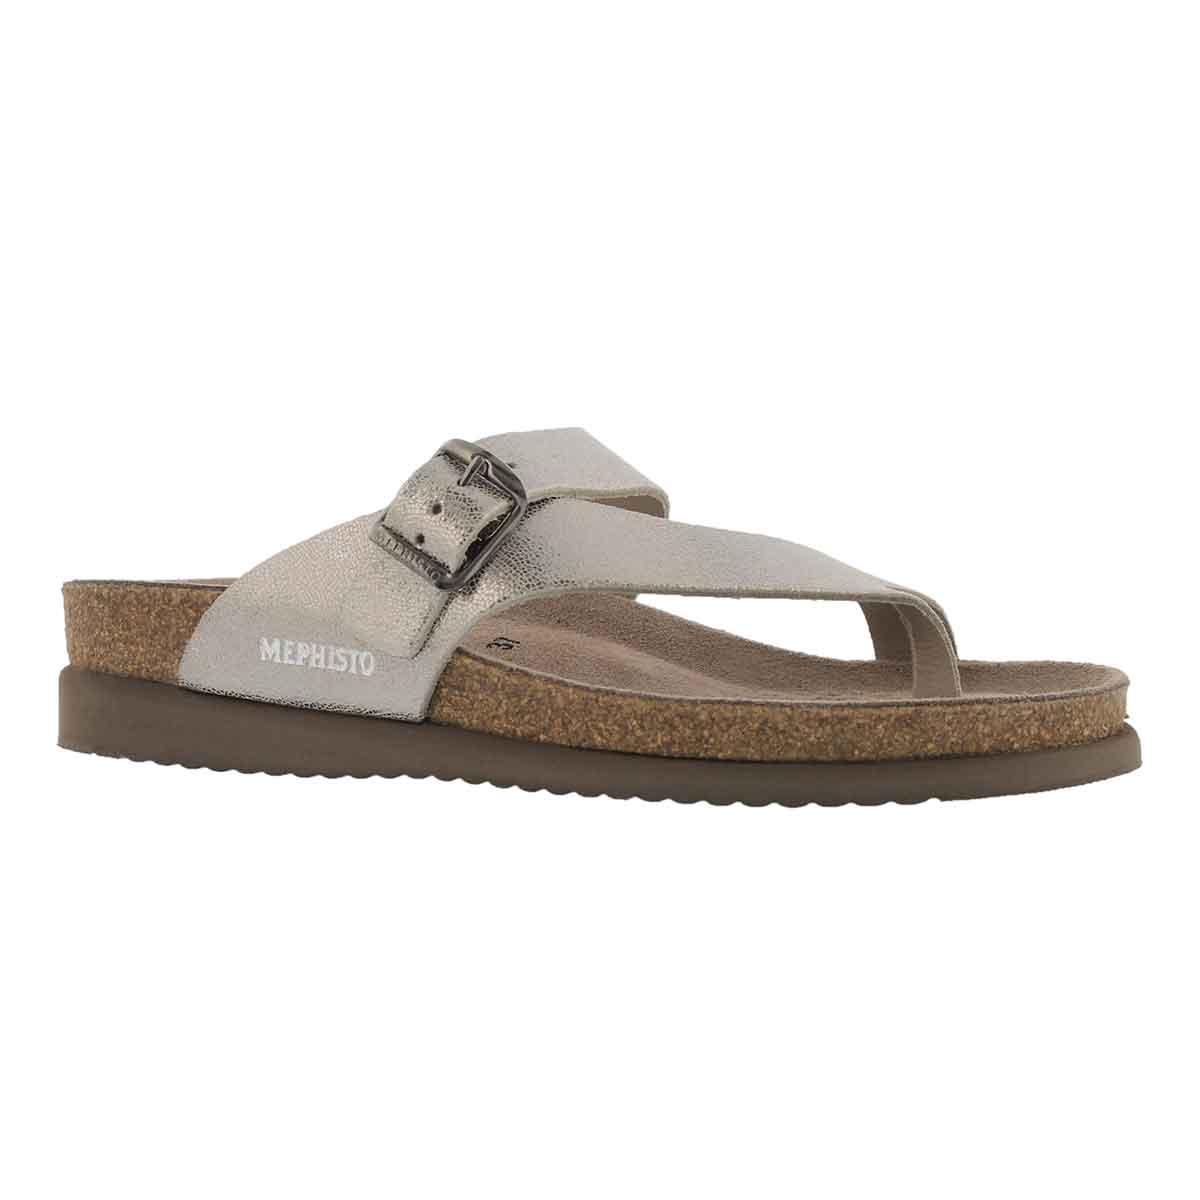 Women's HELEN silver cork footbed thong